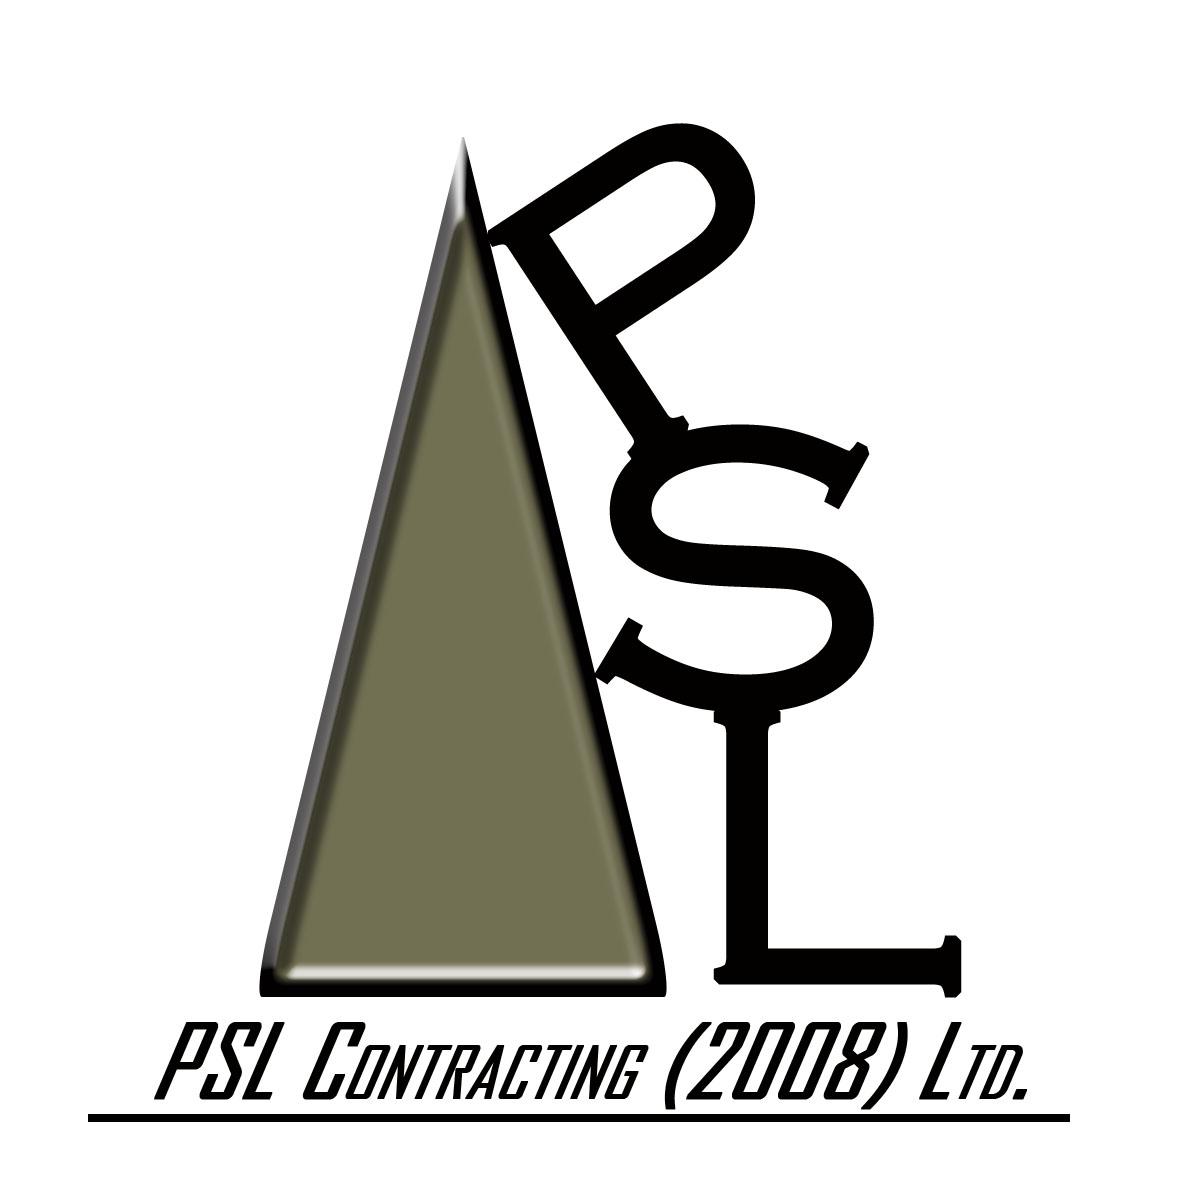 Logo Design by Moag - Entry No. 68 in the Logo Design Contest PSL Contracting (2008) Ltd. Logo Design.